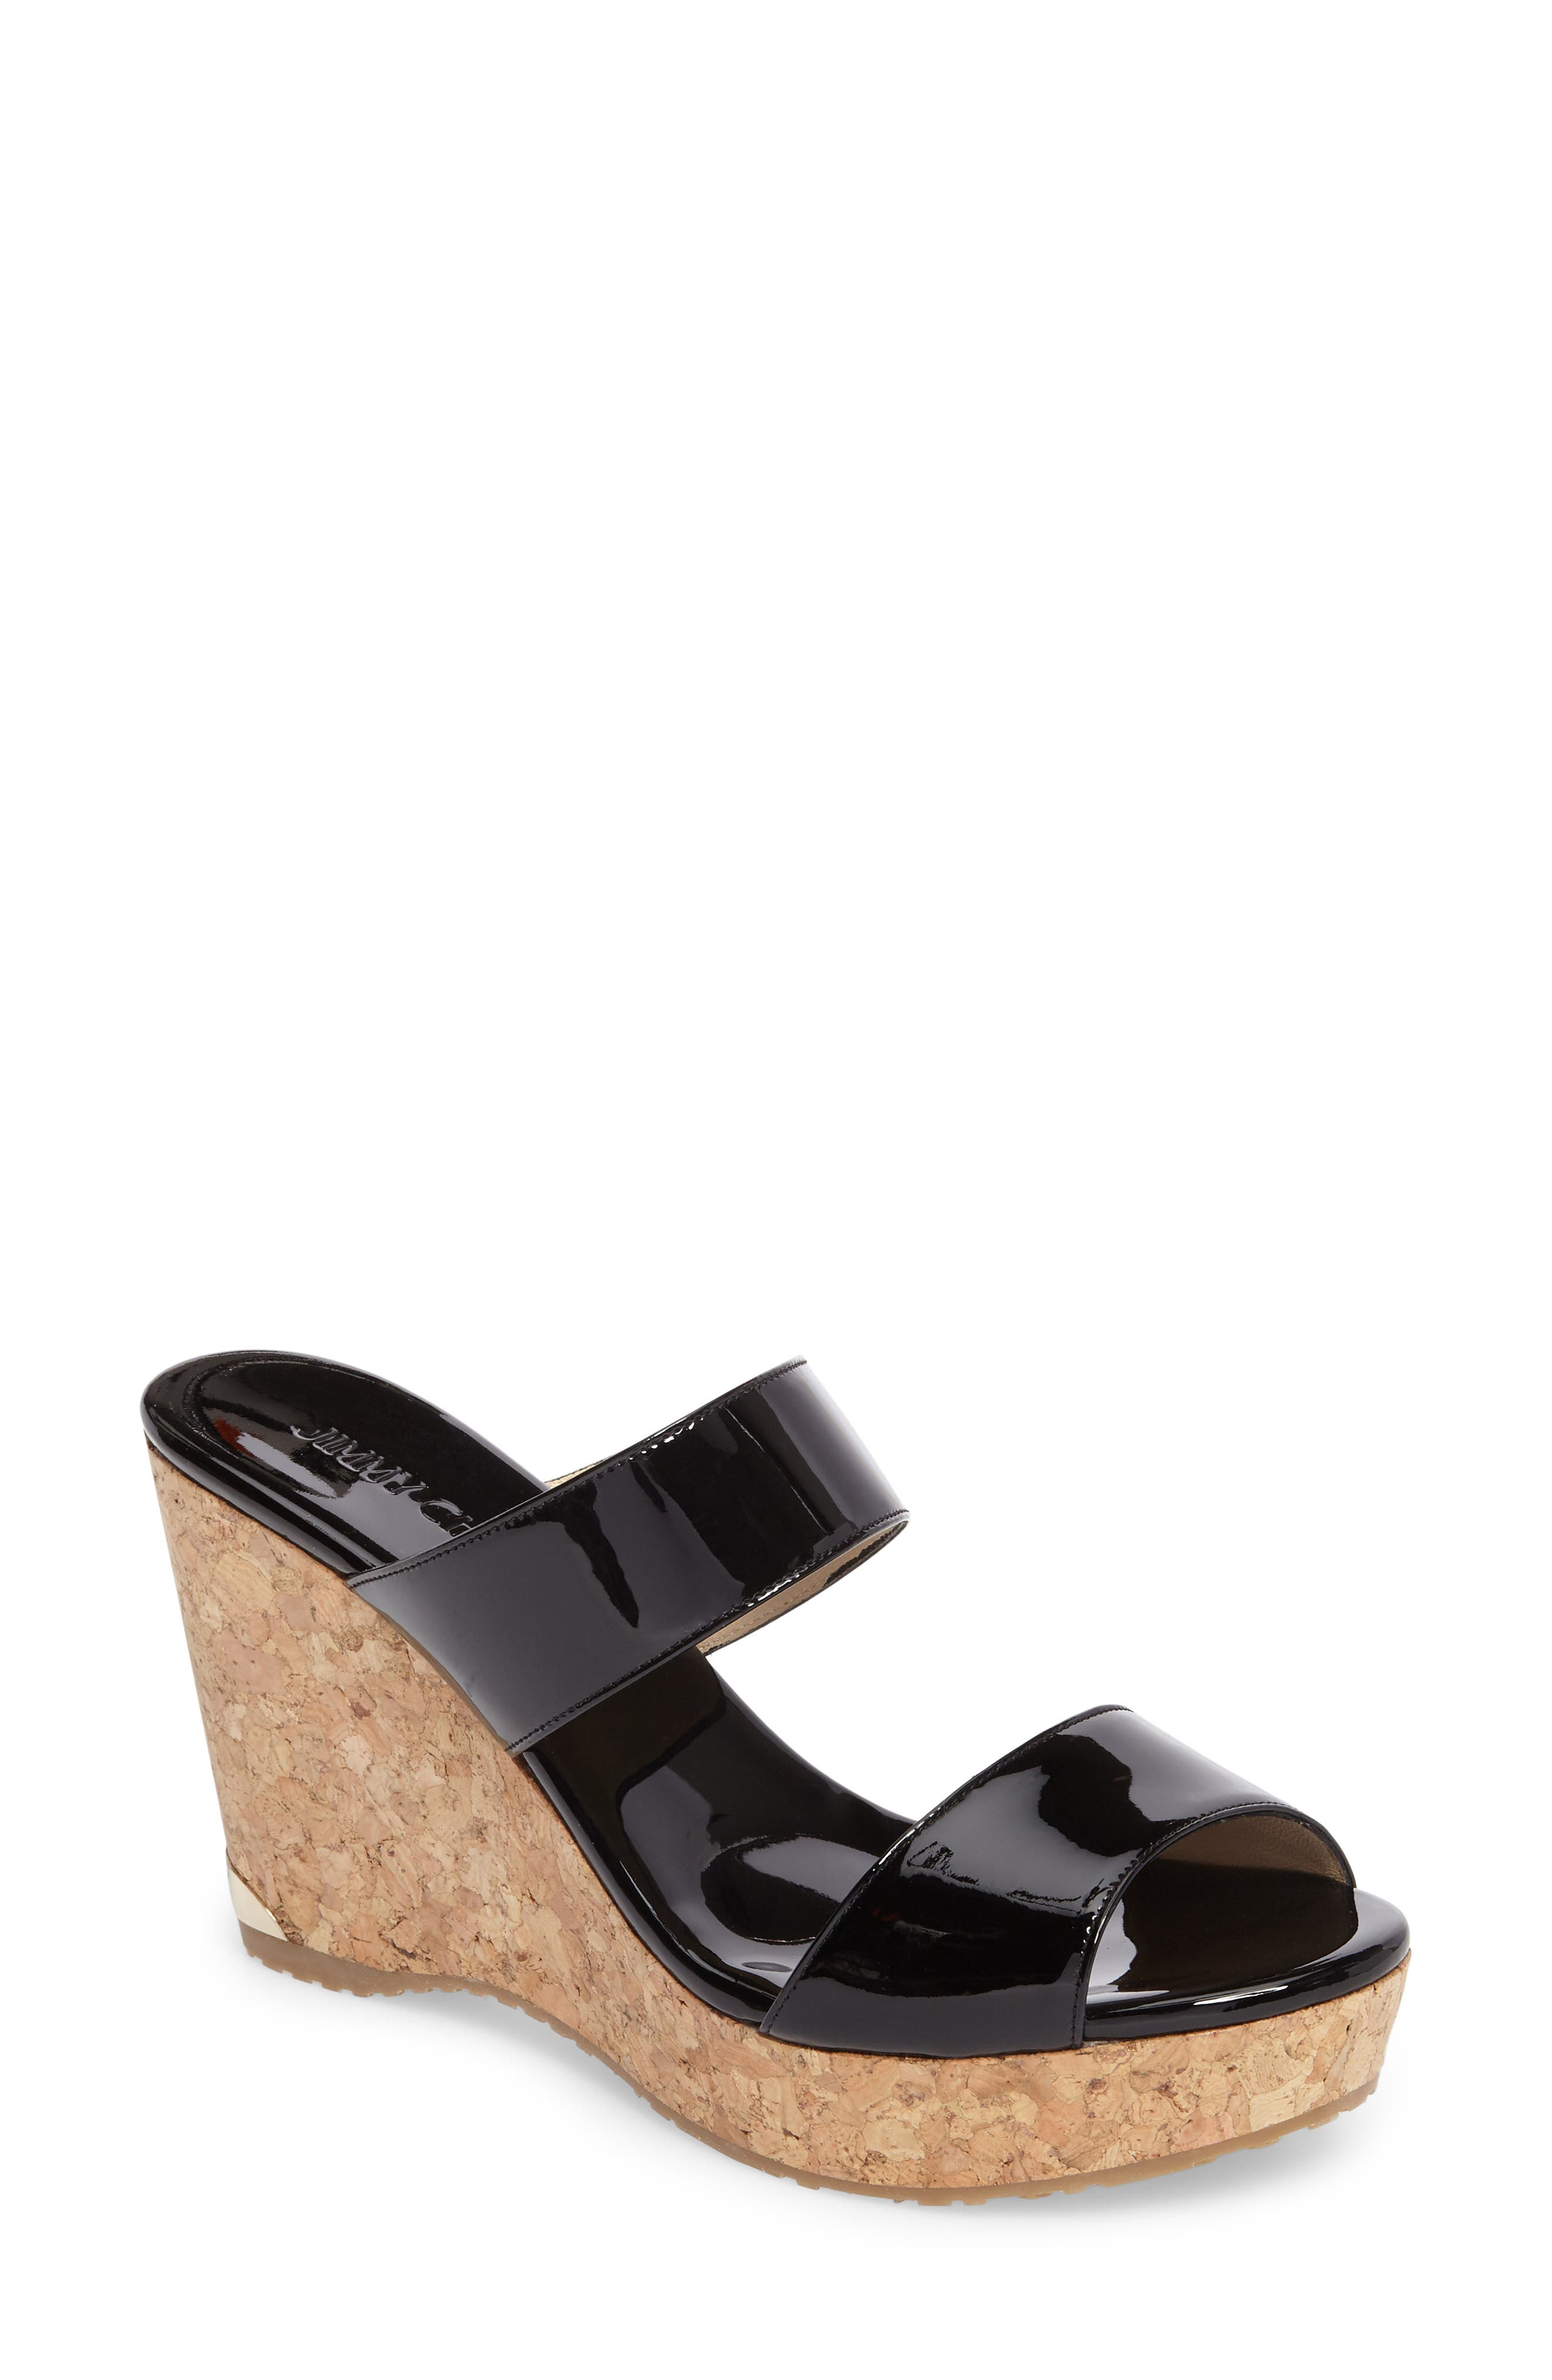 Parker Wedge Sandal,                         Main,                         color, 001